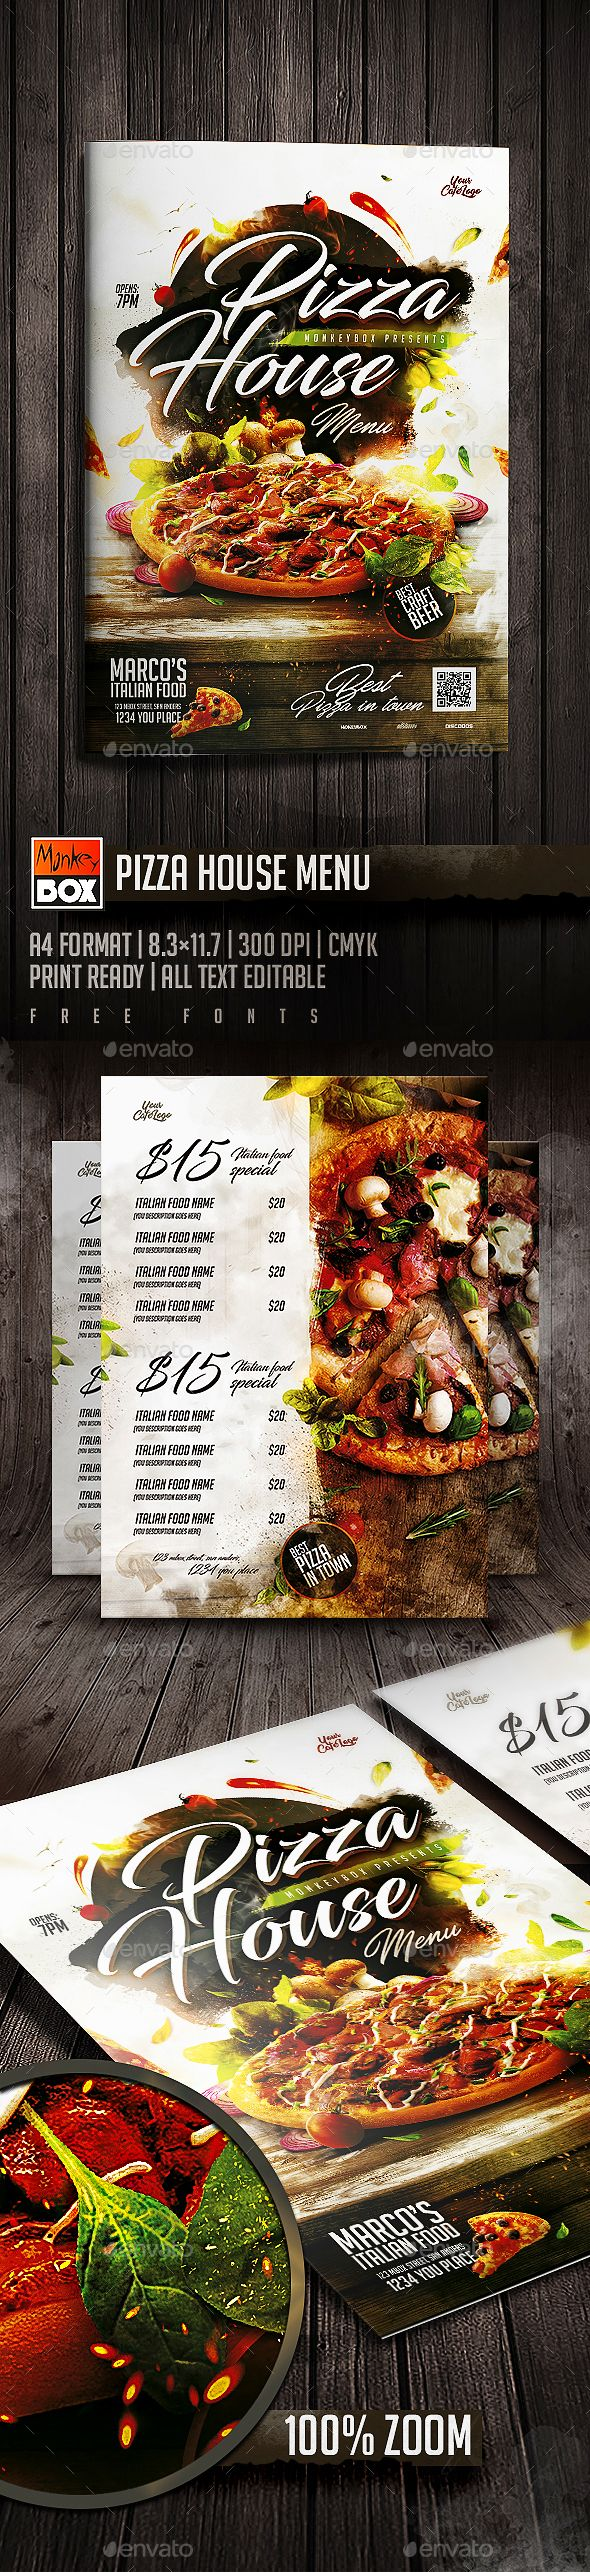 Pizza House Menu — Photoshop PSD #caffe #menu brochure • Download ➝ https://graphicriver.net/item/pizza-house-menu/19667416?ref=pxcr